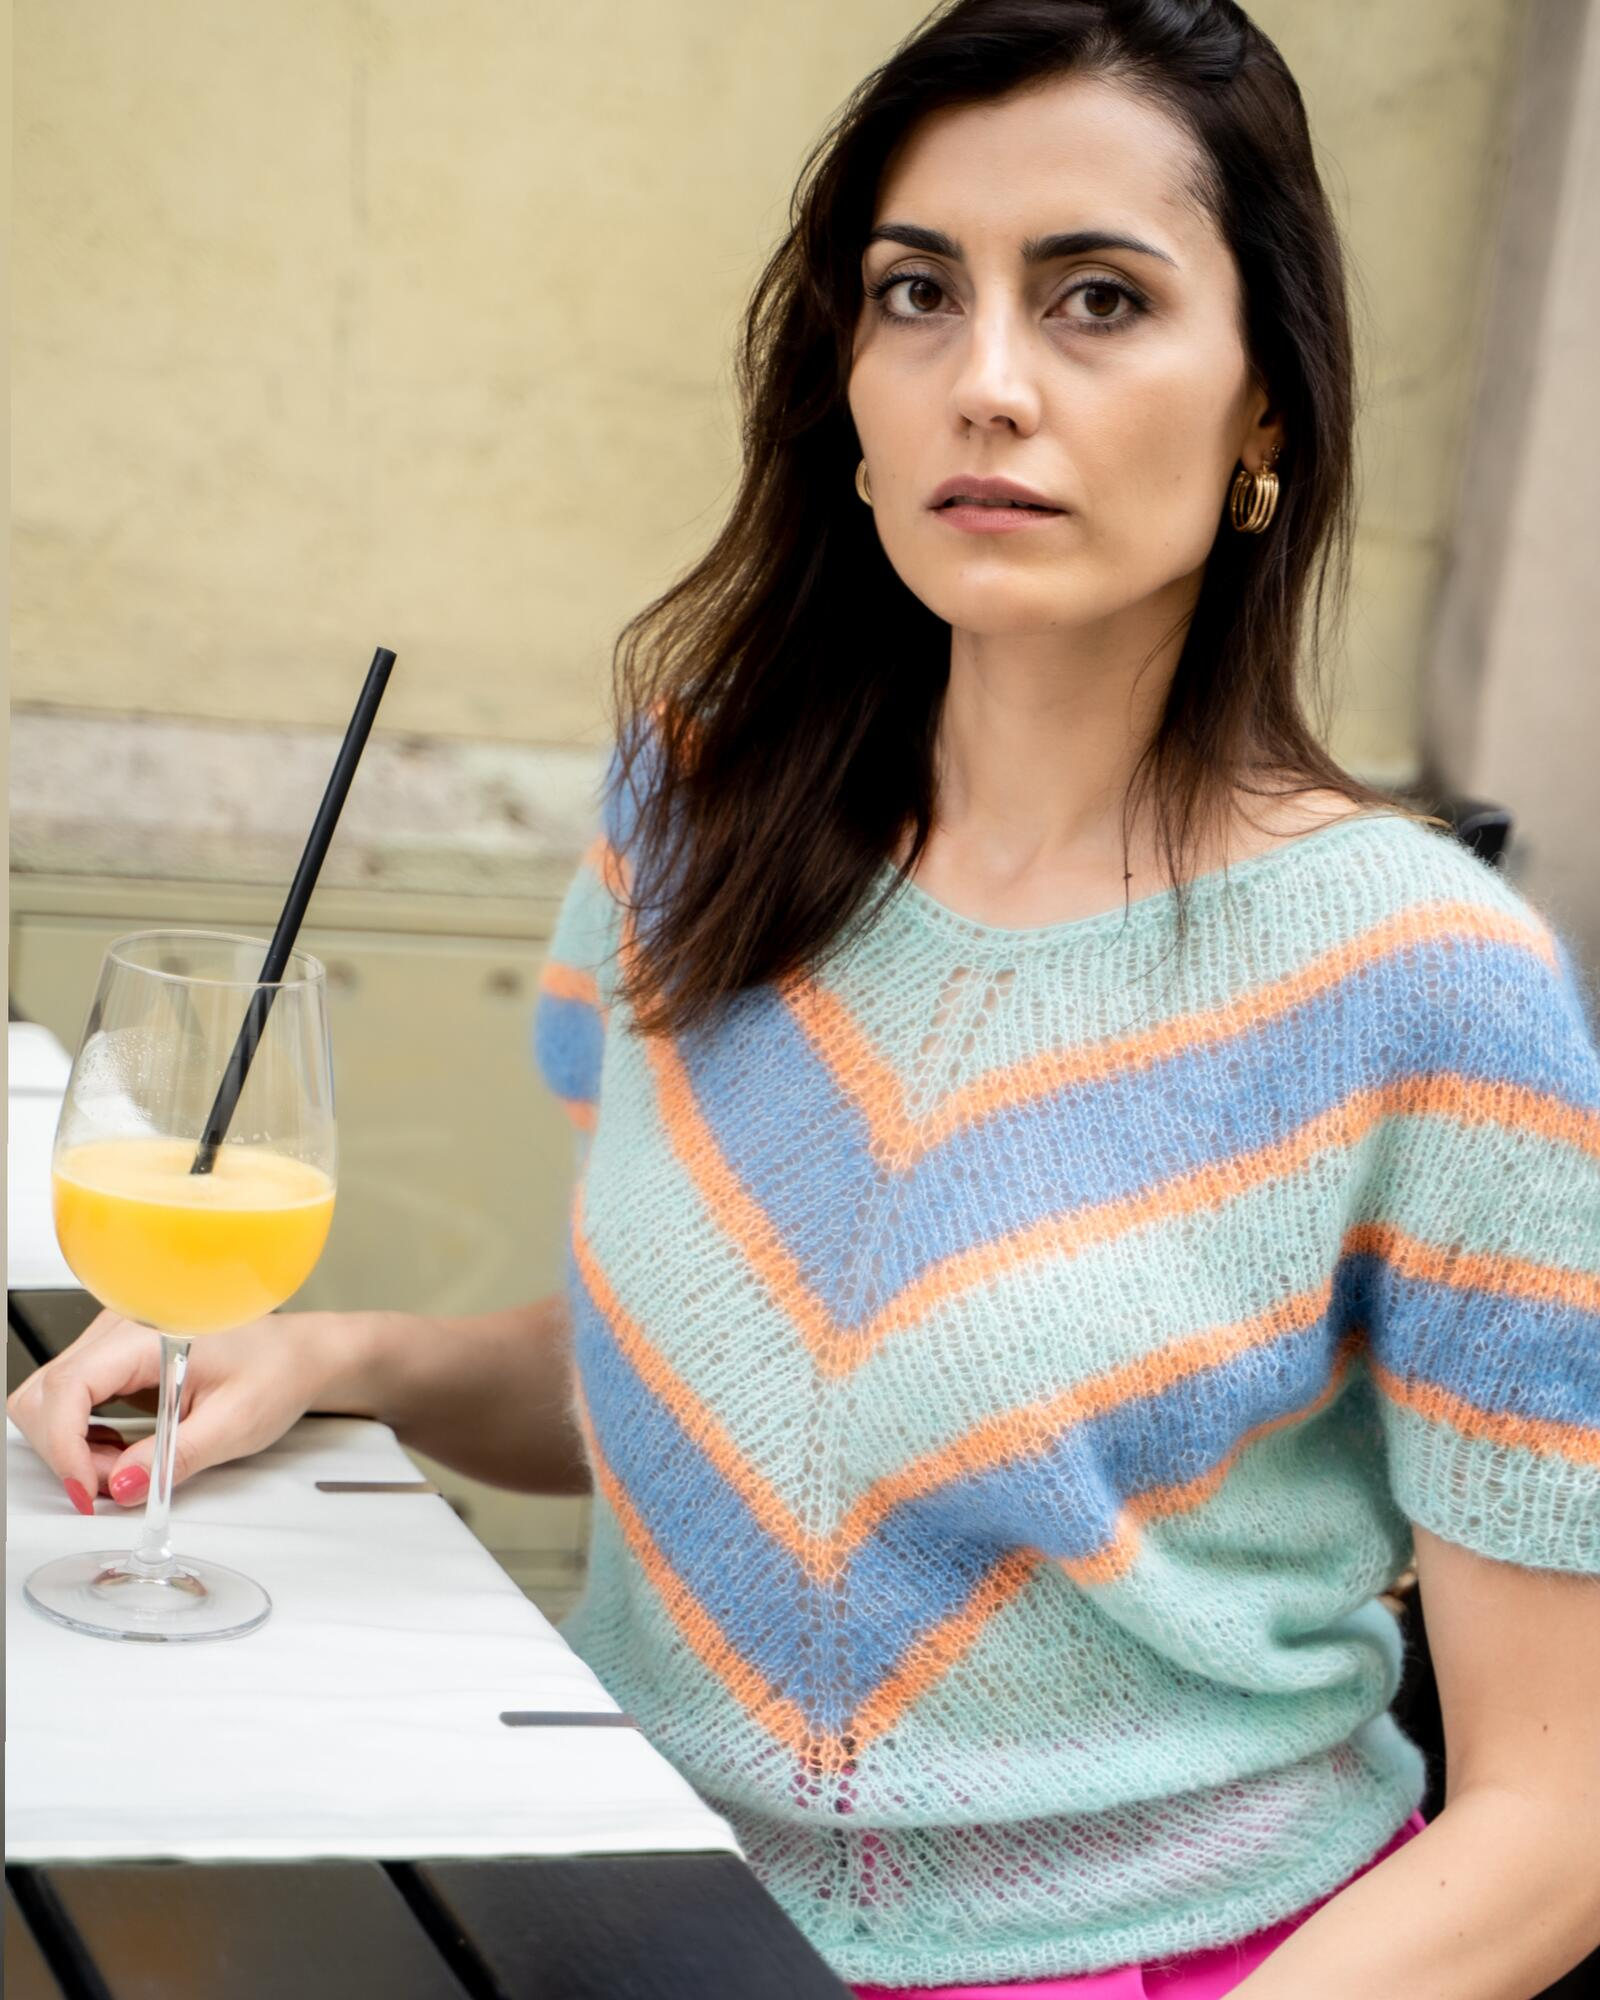 Sweterek PUNTA CANA - SYLVIA DARA SYLWIA DYDA | JestemSlow.pl